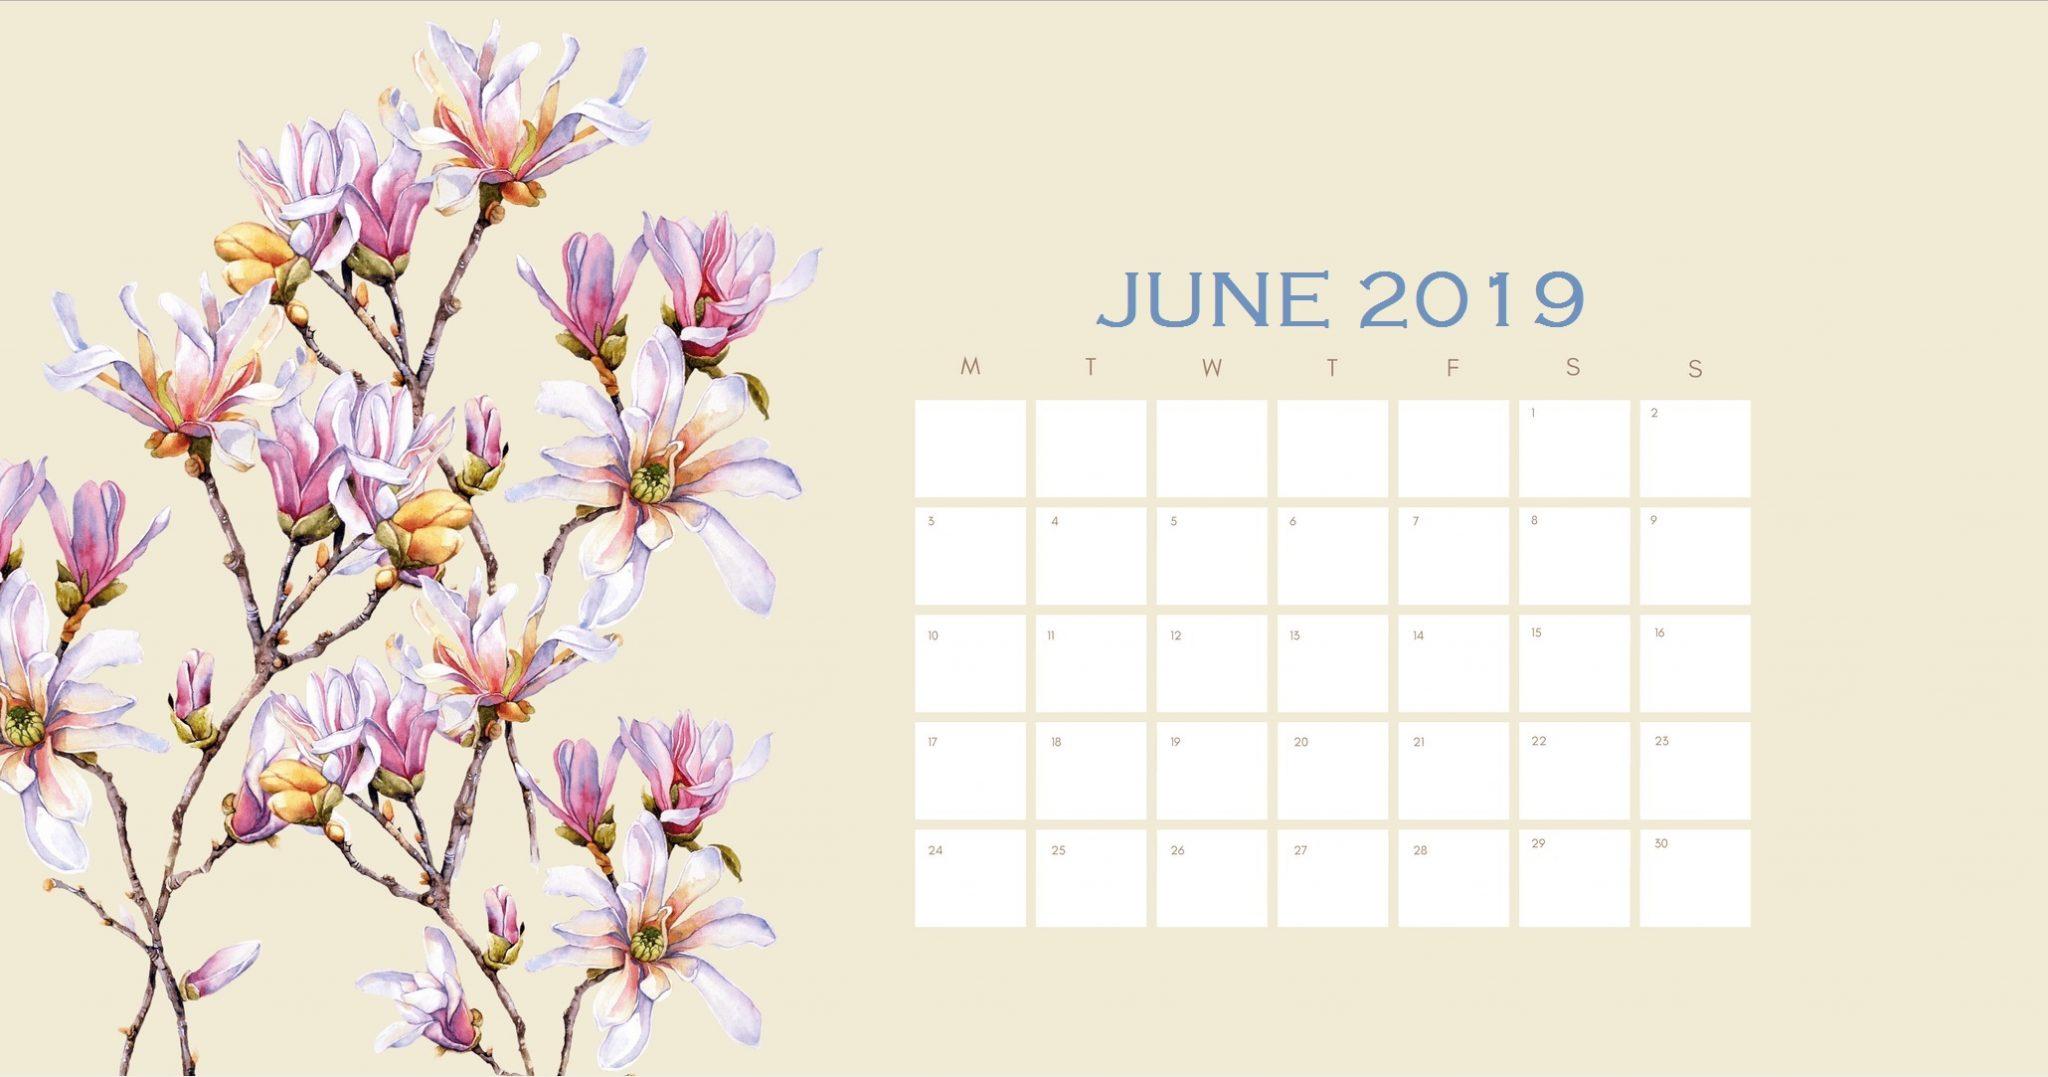 Beautiful June 2019 Calendar Design